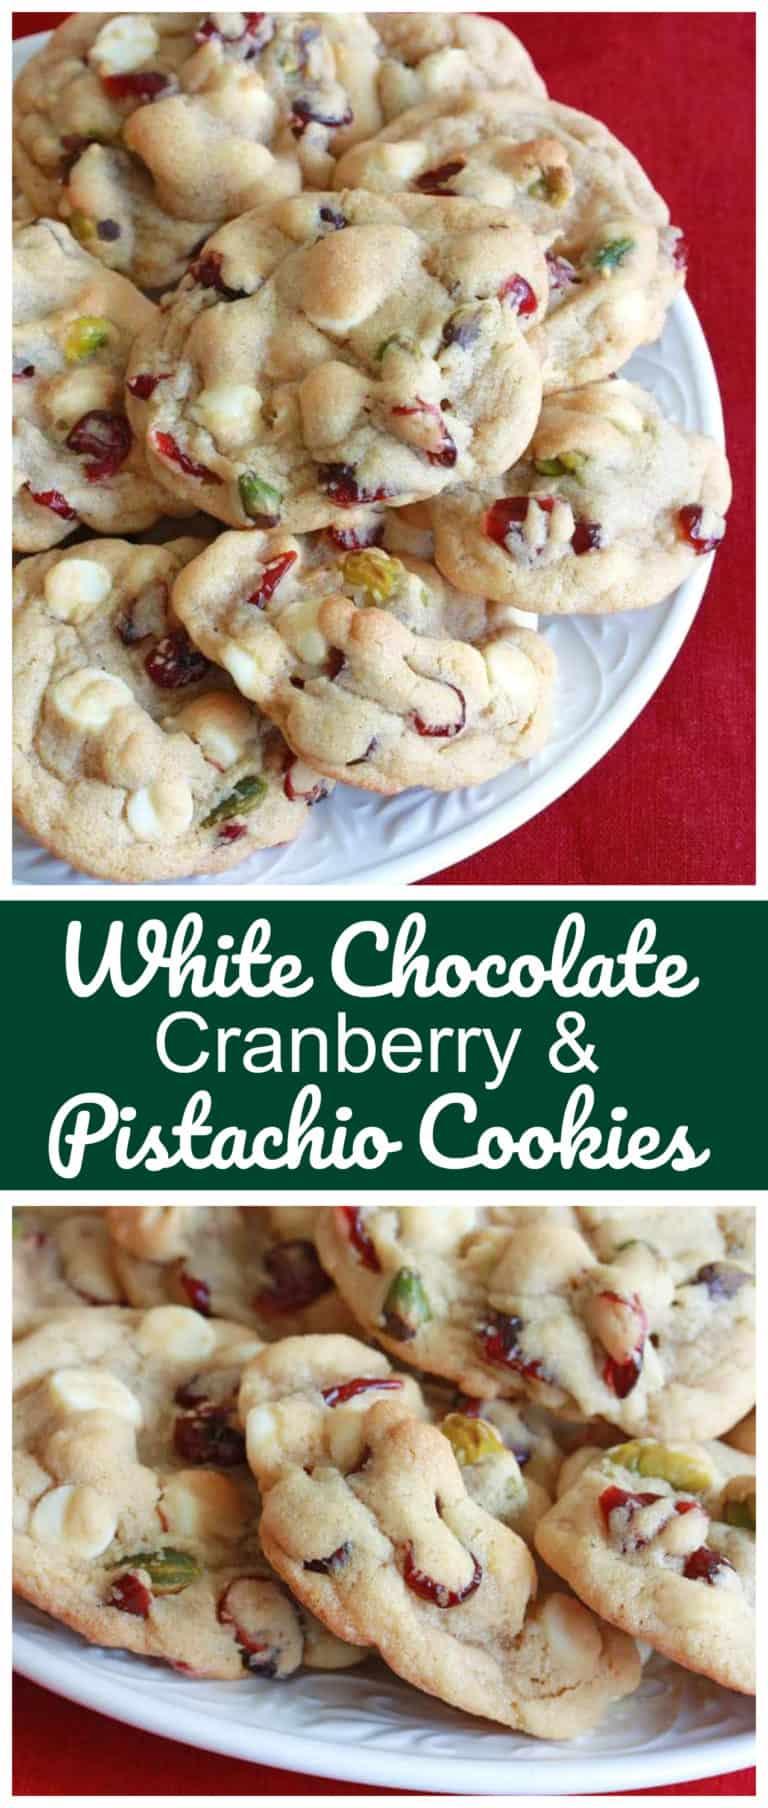 white chocolate cranberry pistachio cookies recipe cherry